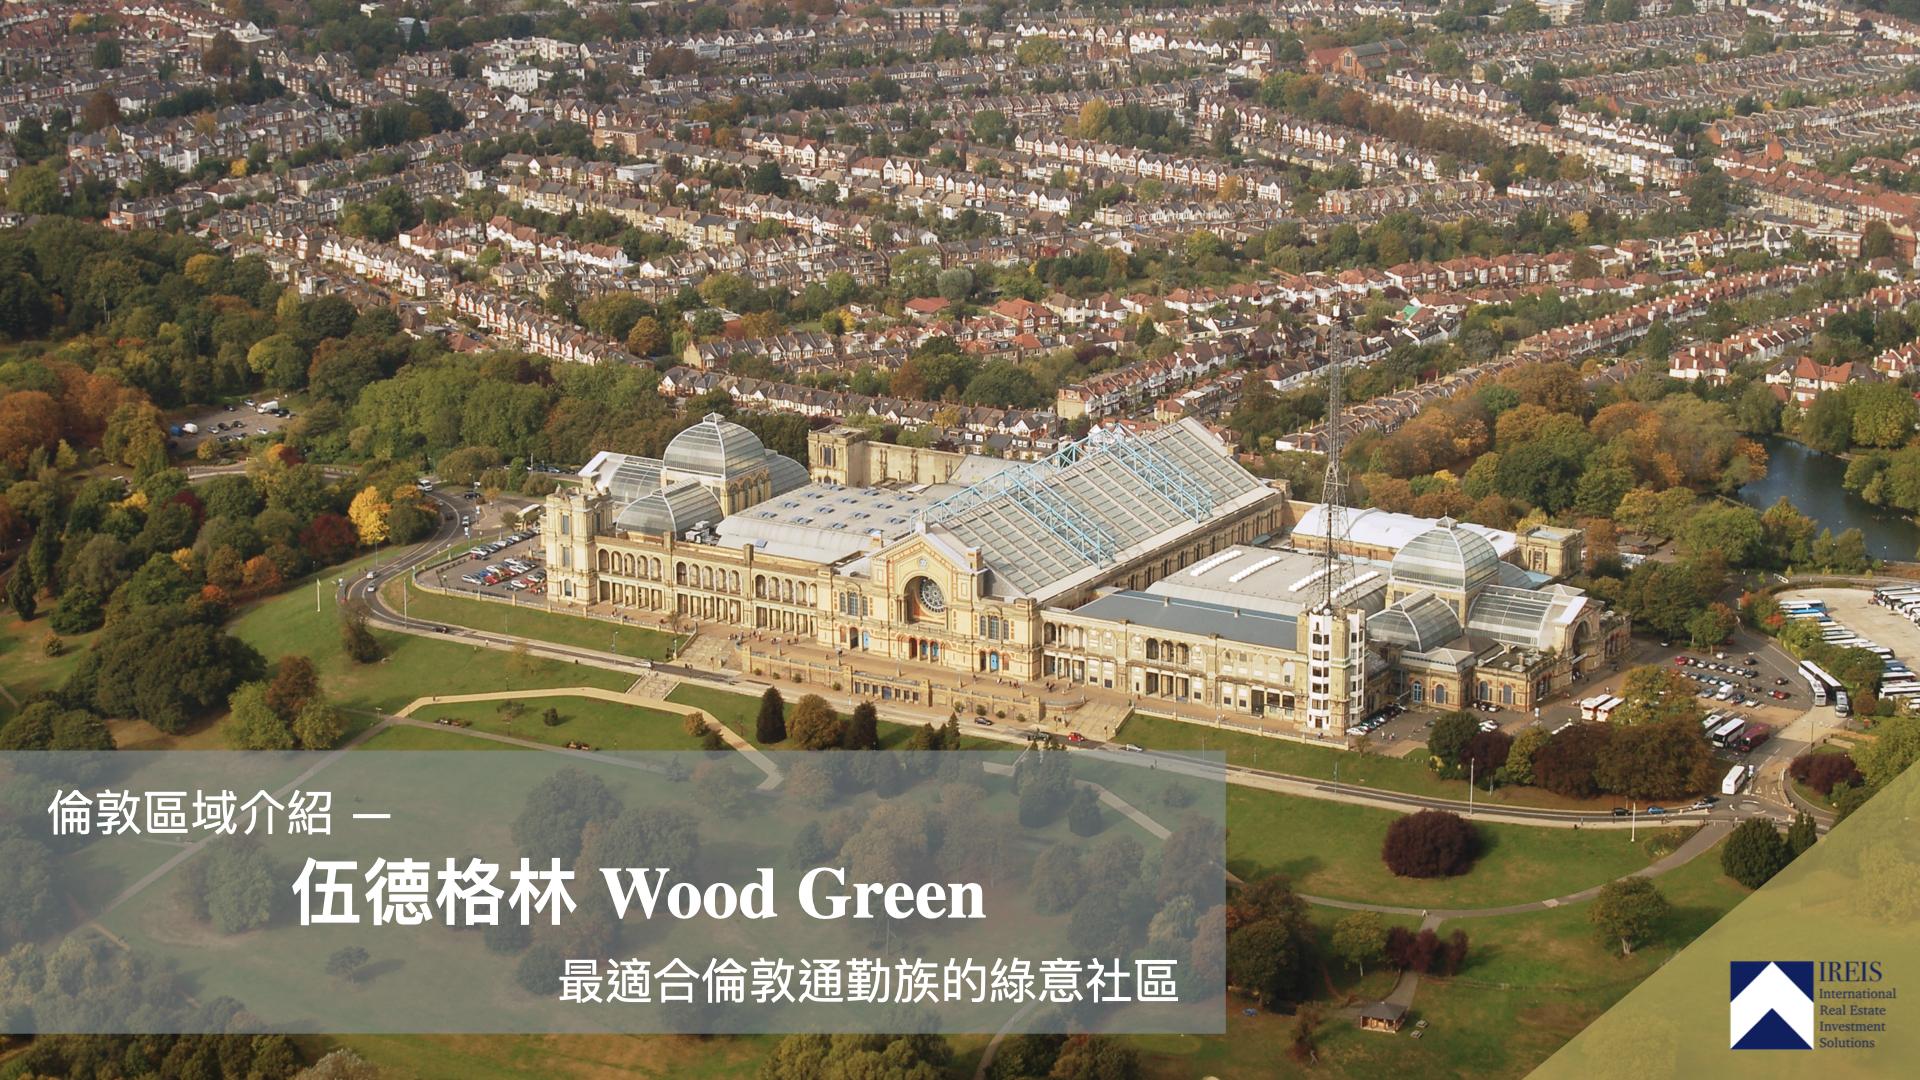 倫敦伍德格林 Wood Green 區域介紹